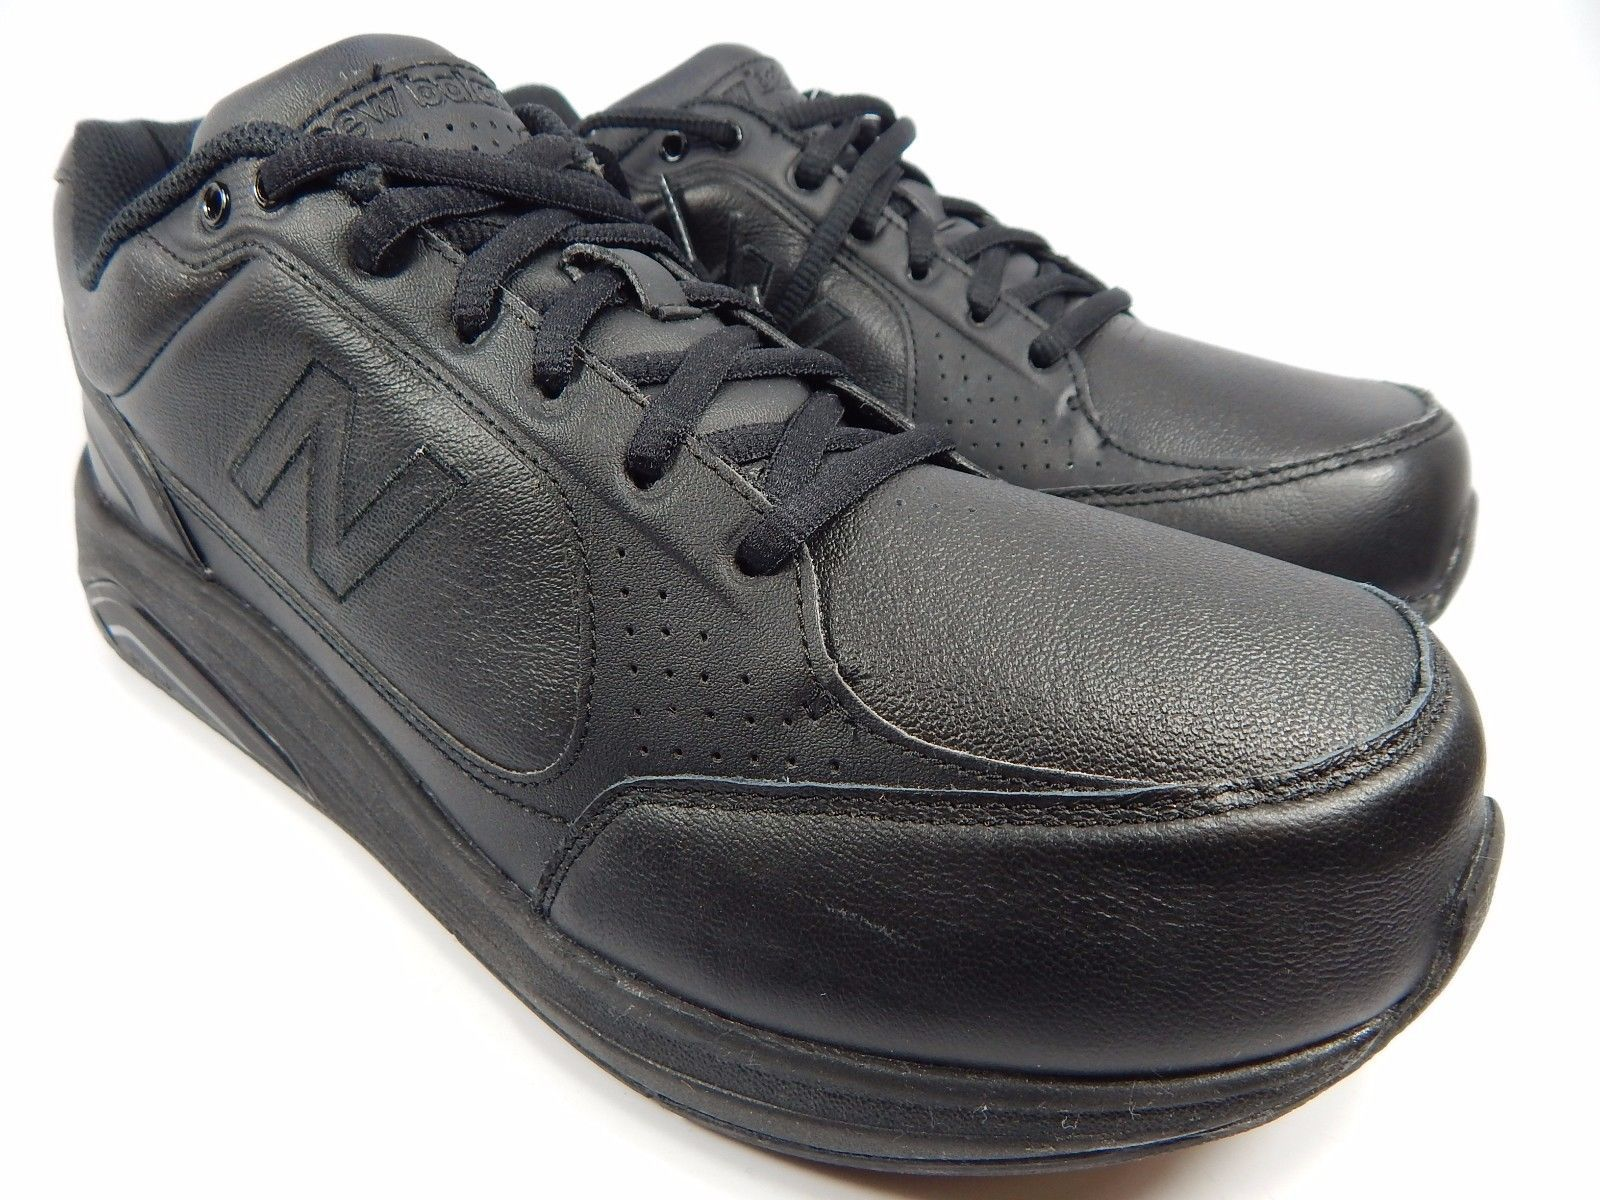 MISMATCH New Balance 928 Mens Shoes Size 8 2E WIDE LEFT & 9 4E EXTRA WIDE Right